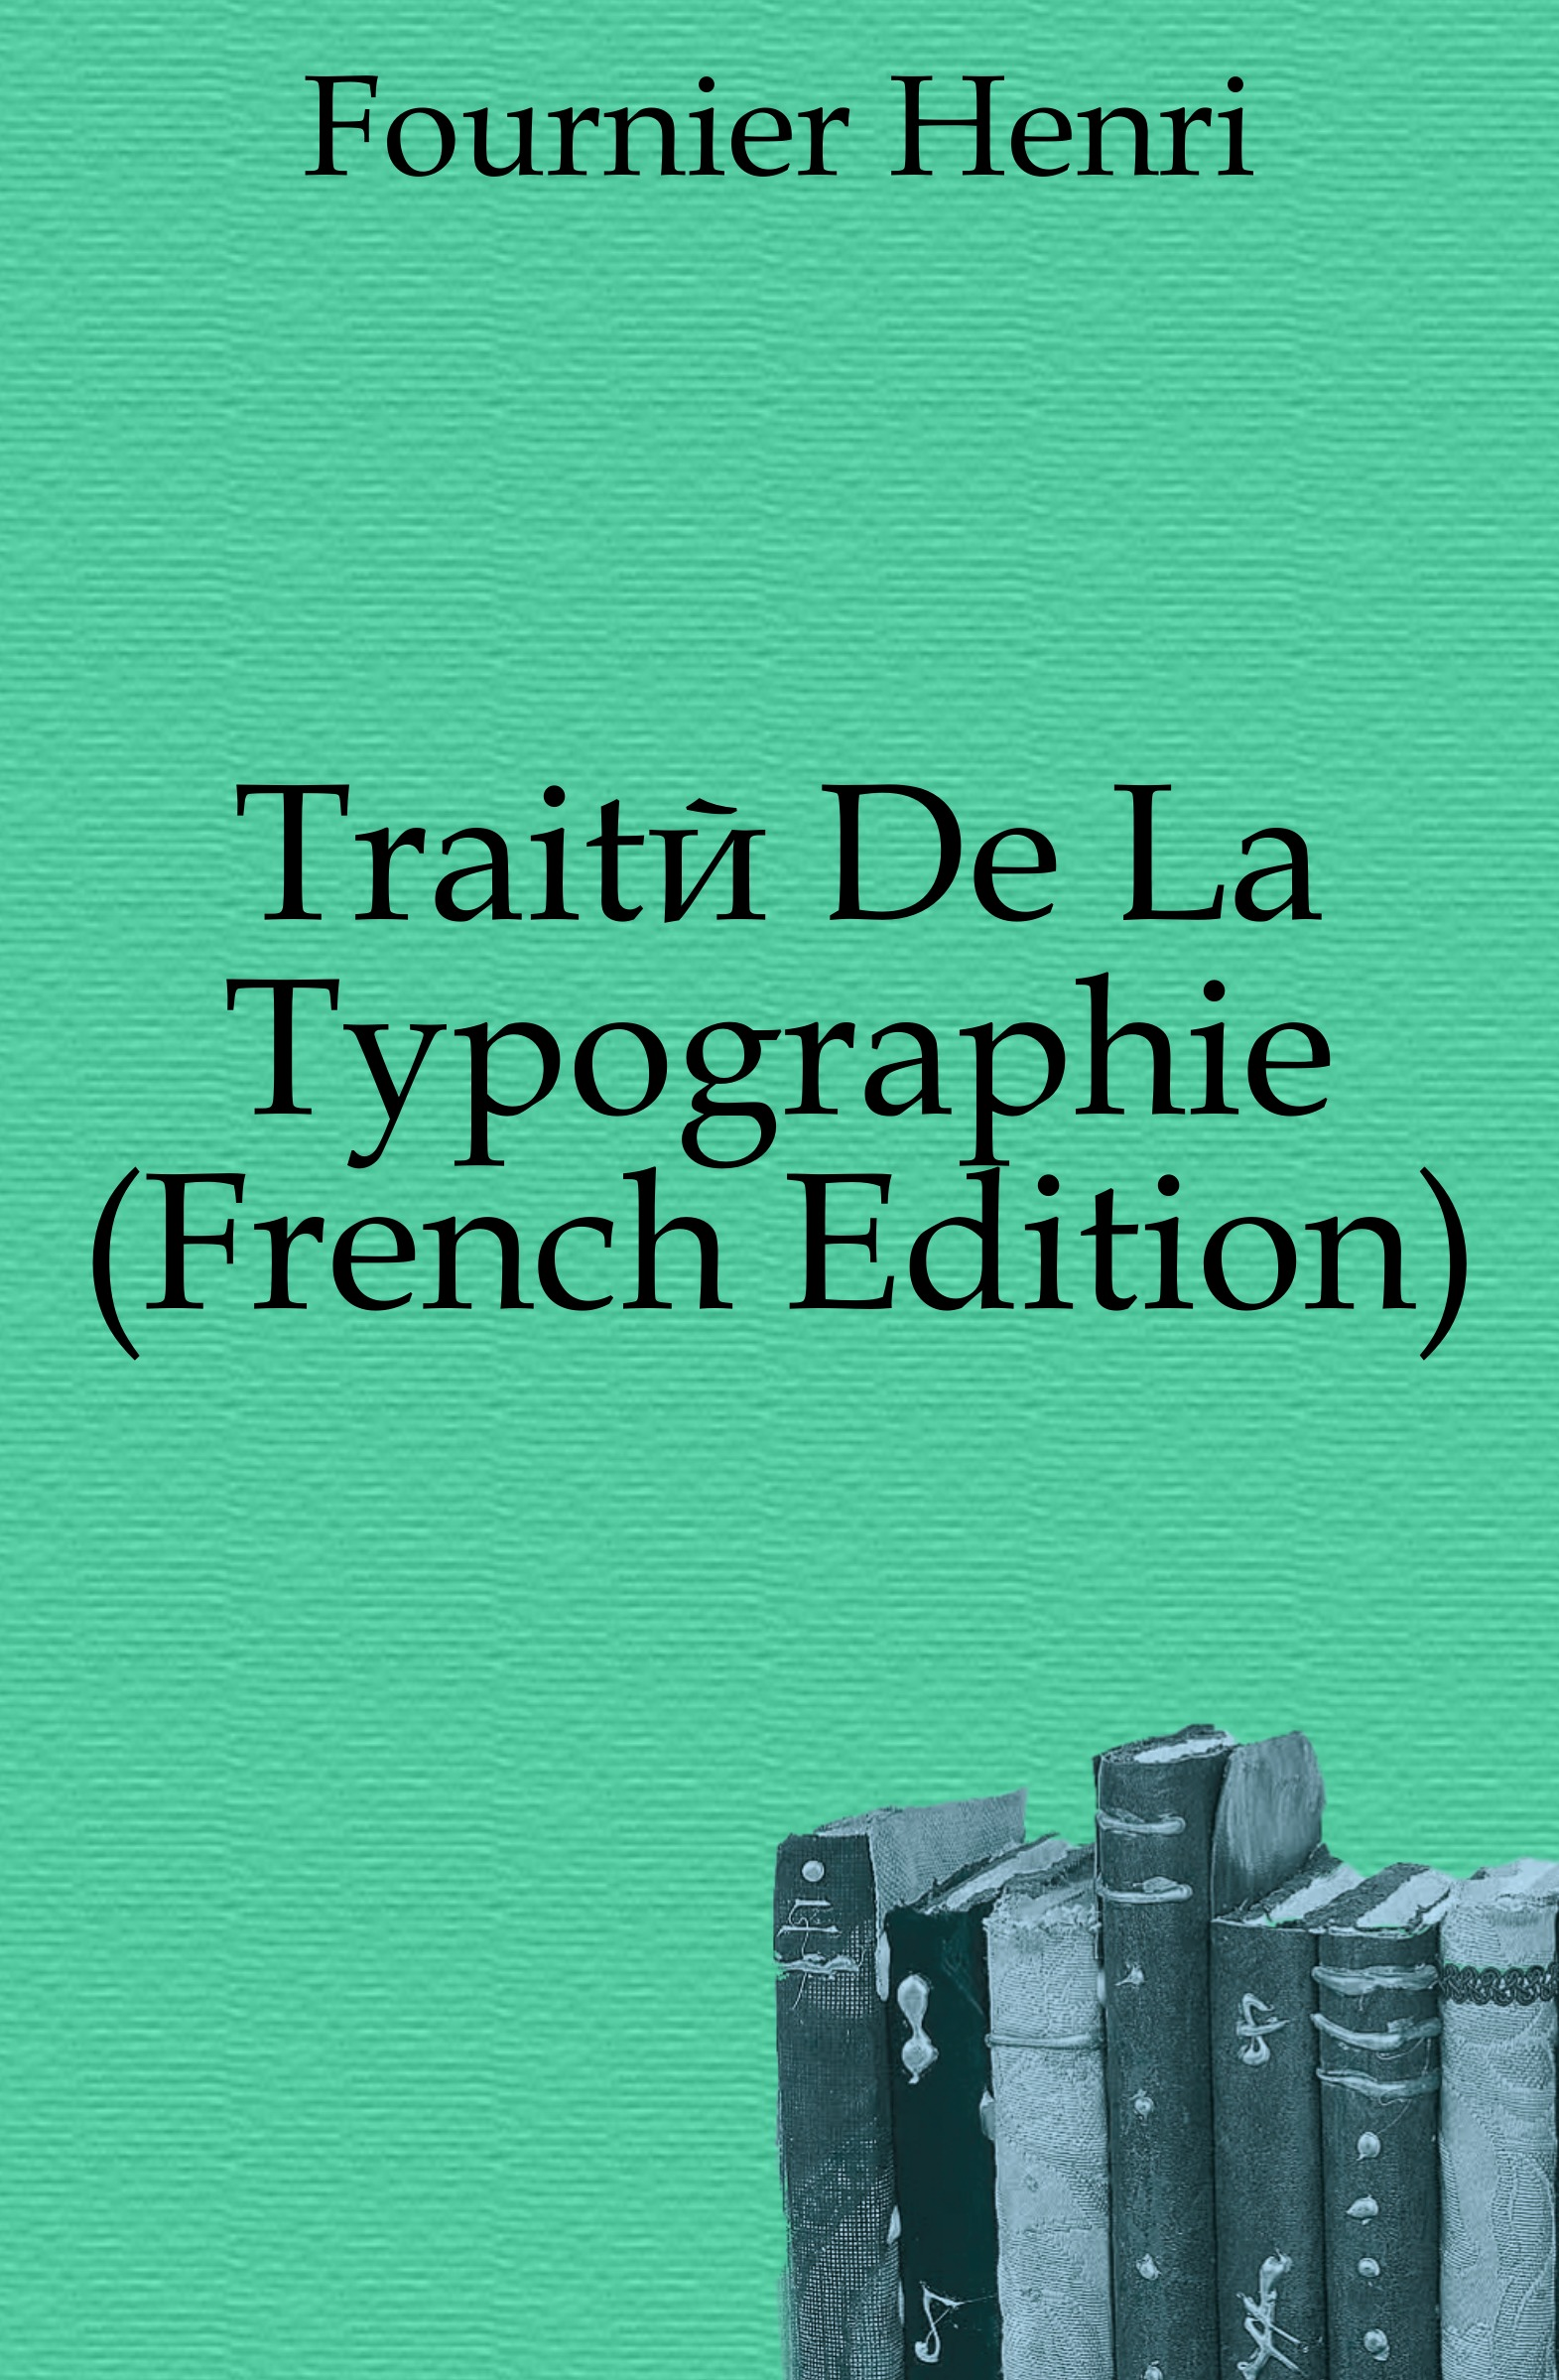 Fournier Henri Traite De La Typographie (French Edition) henri fournier traite de la typographie classic reprint